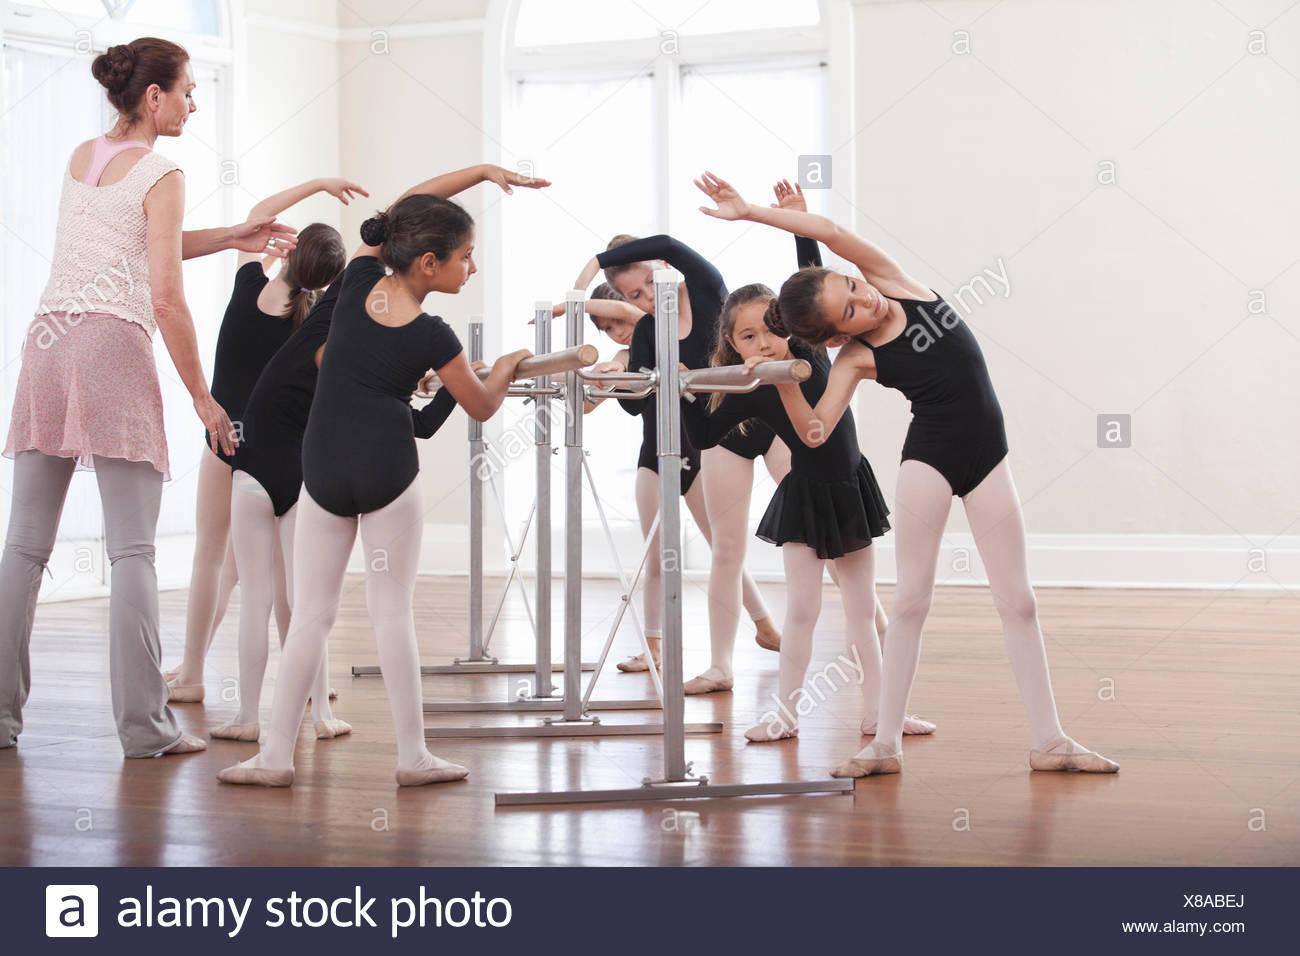 Ballett Unterricht Lehrergruppe Mädchen Ballett Haltung bei der barre Stockbild